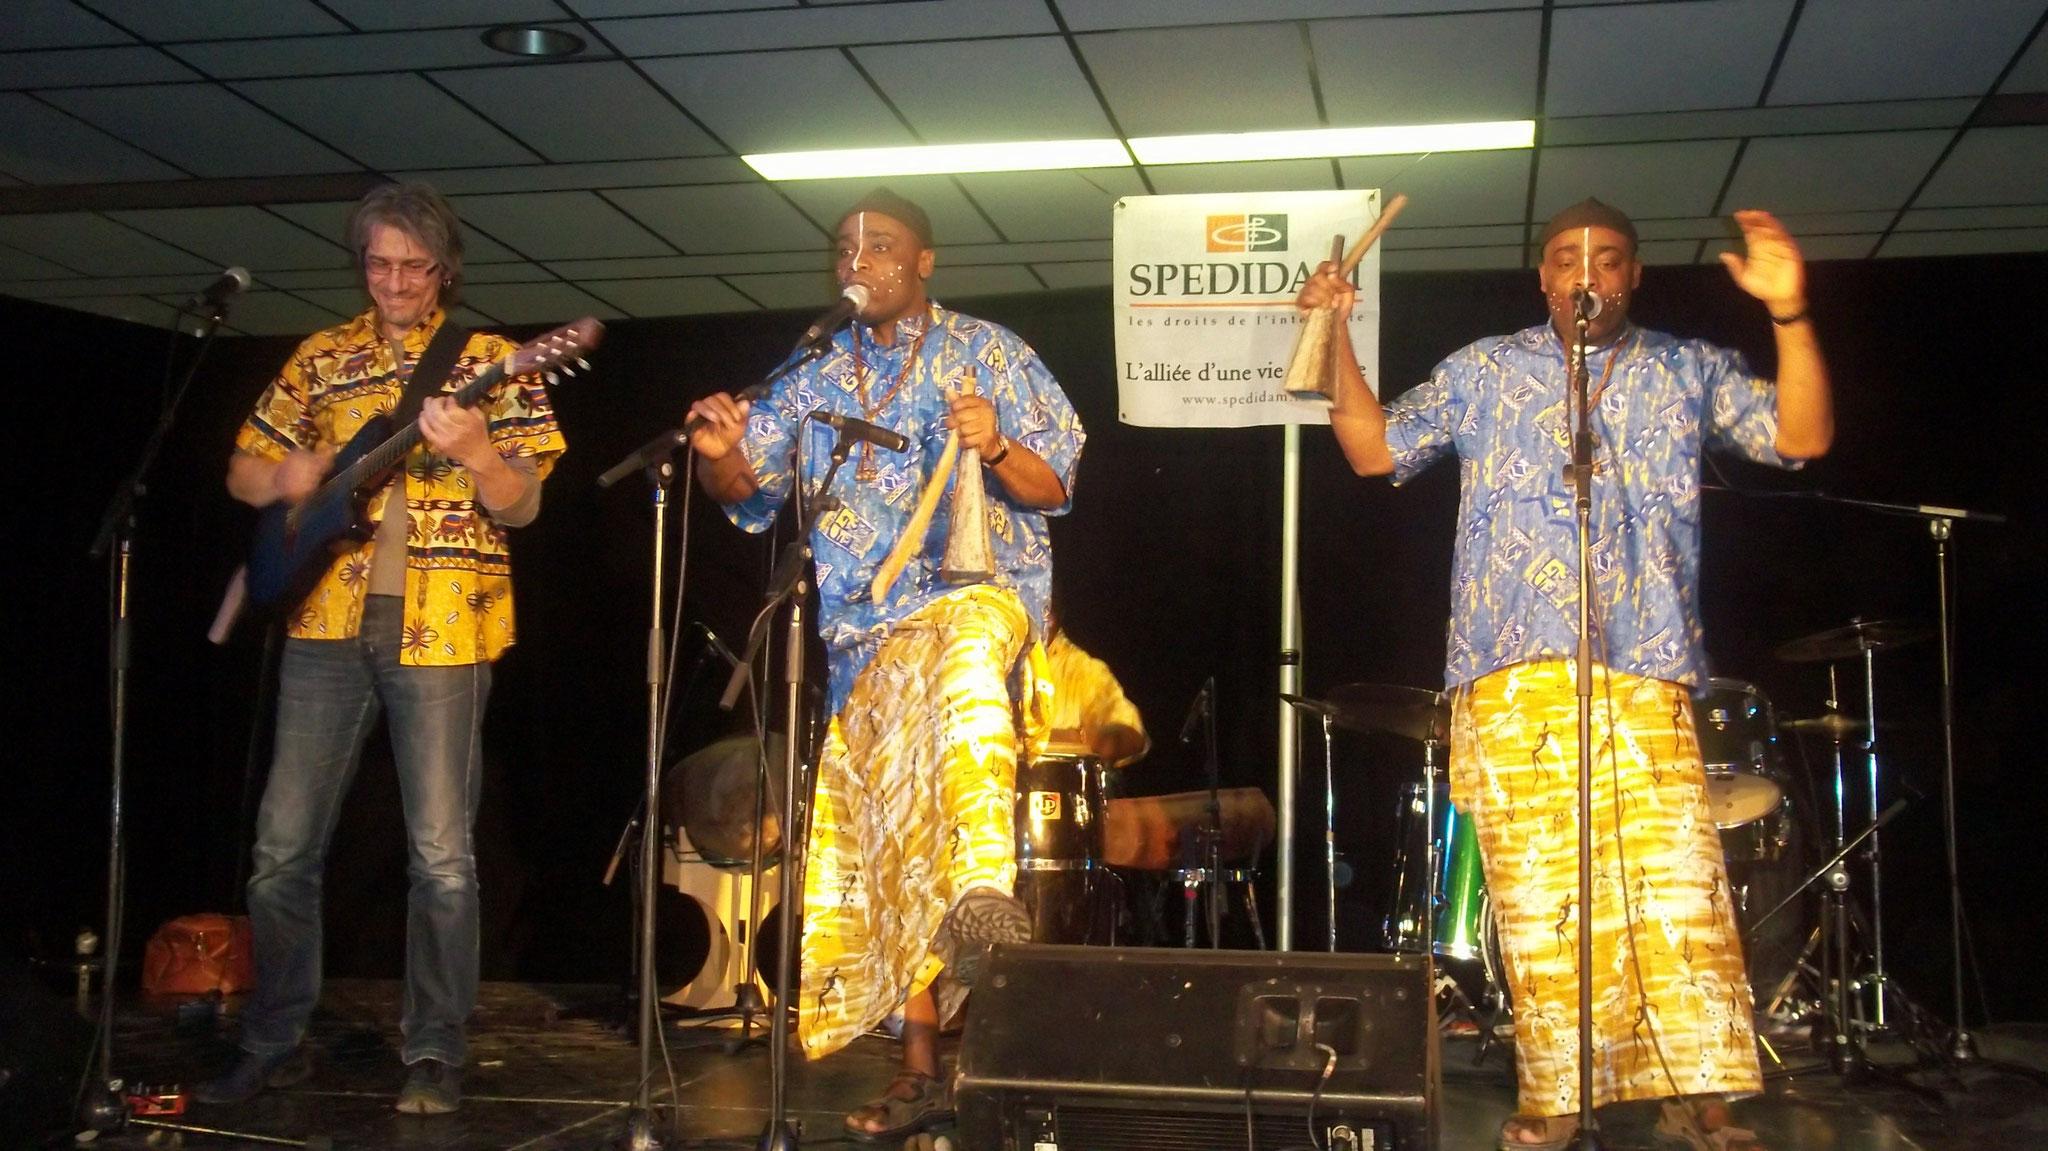 Les Jumeaux de MASAO (Masao Masu) en concert  à Montréal